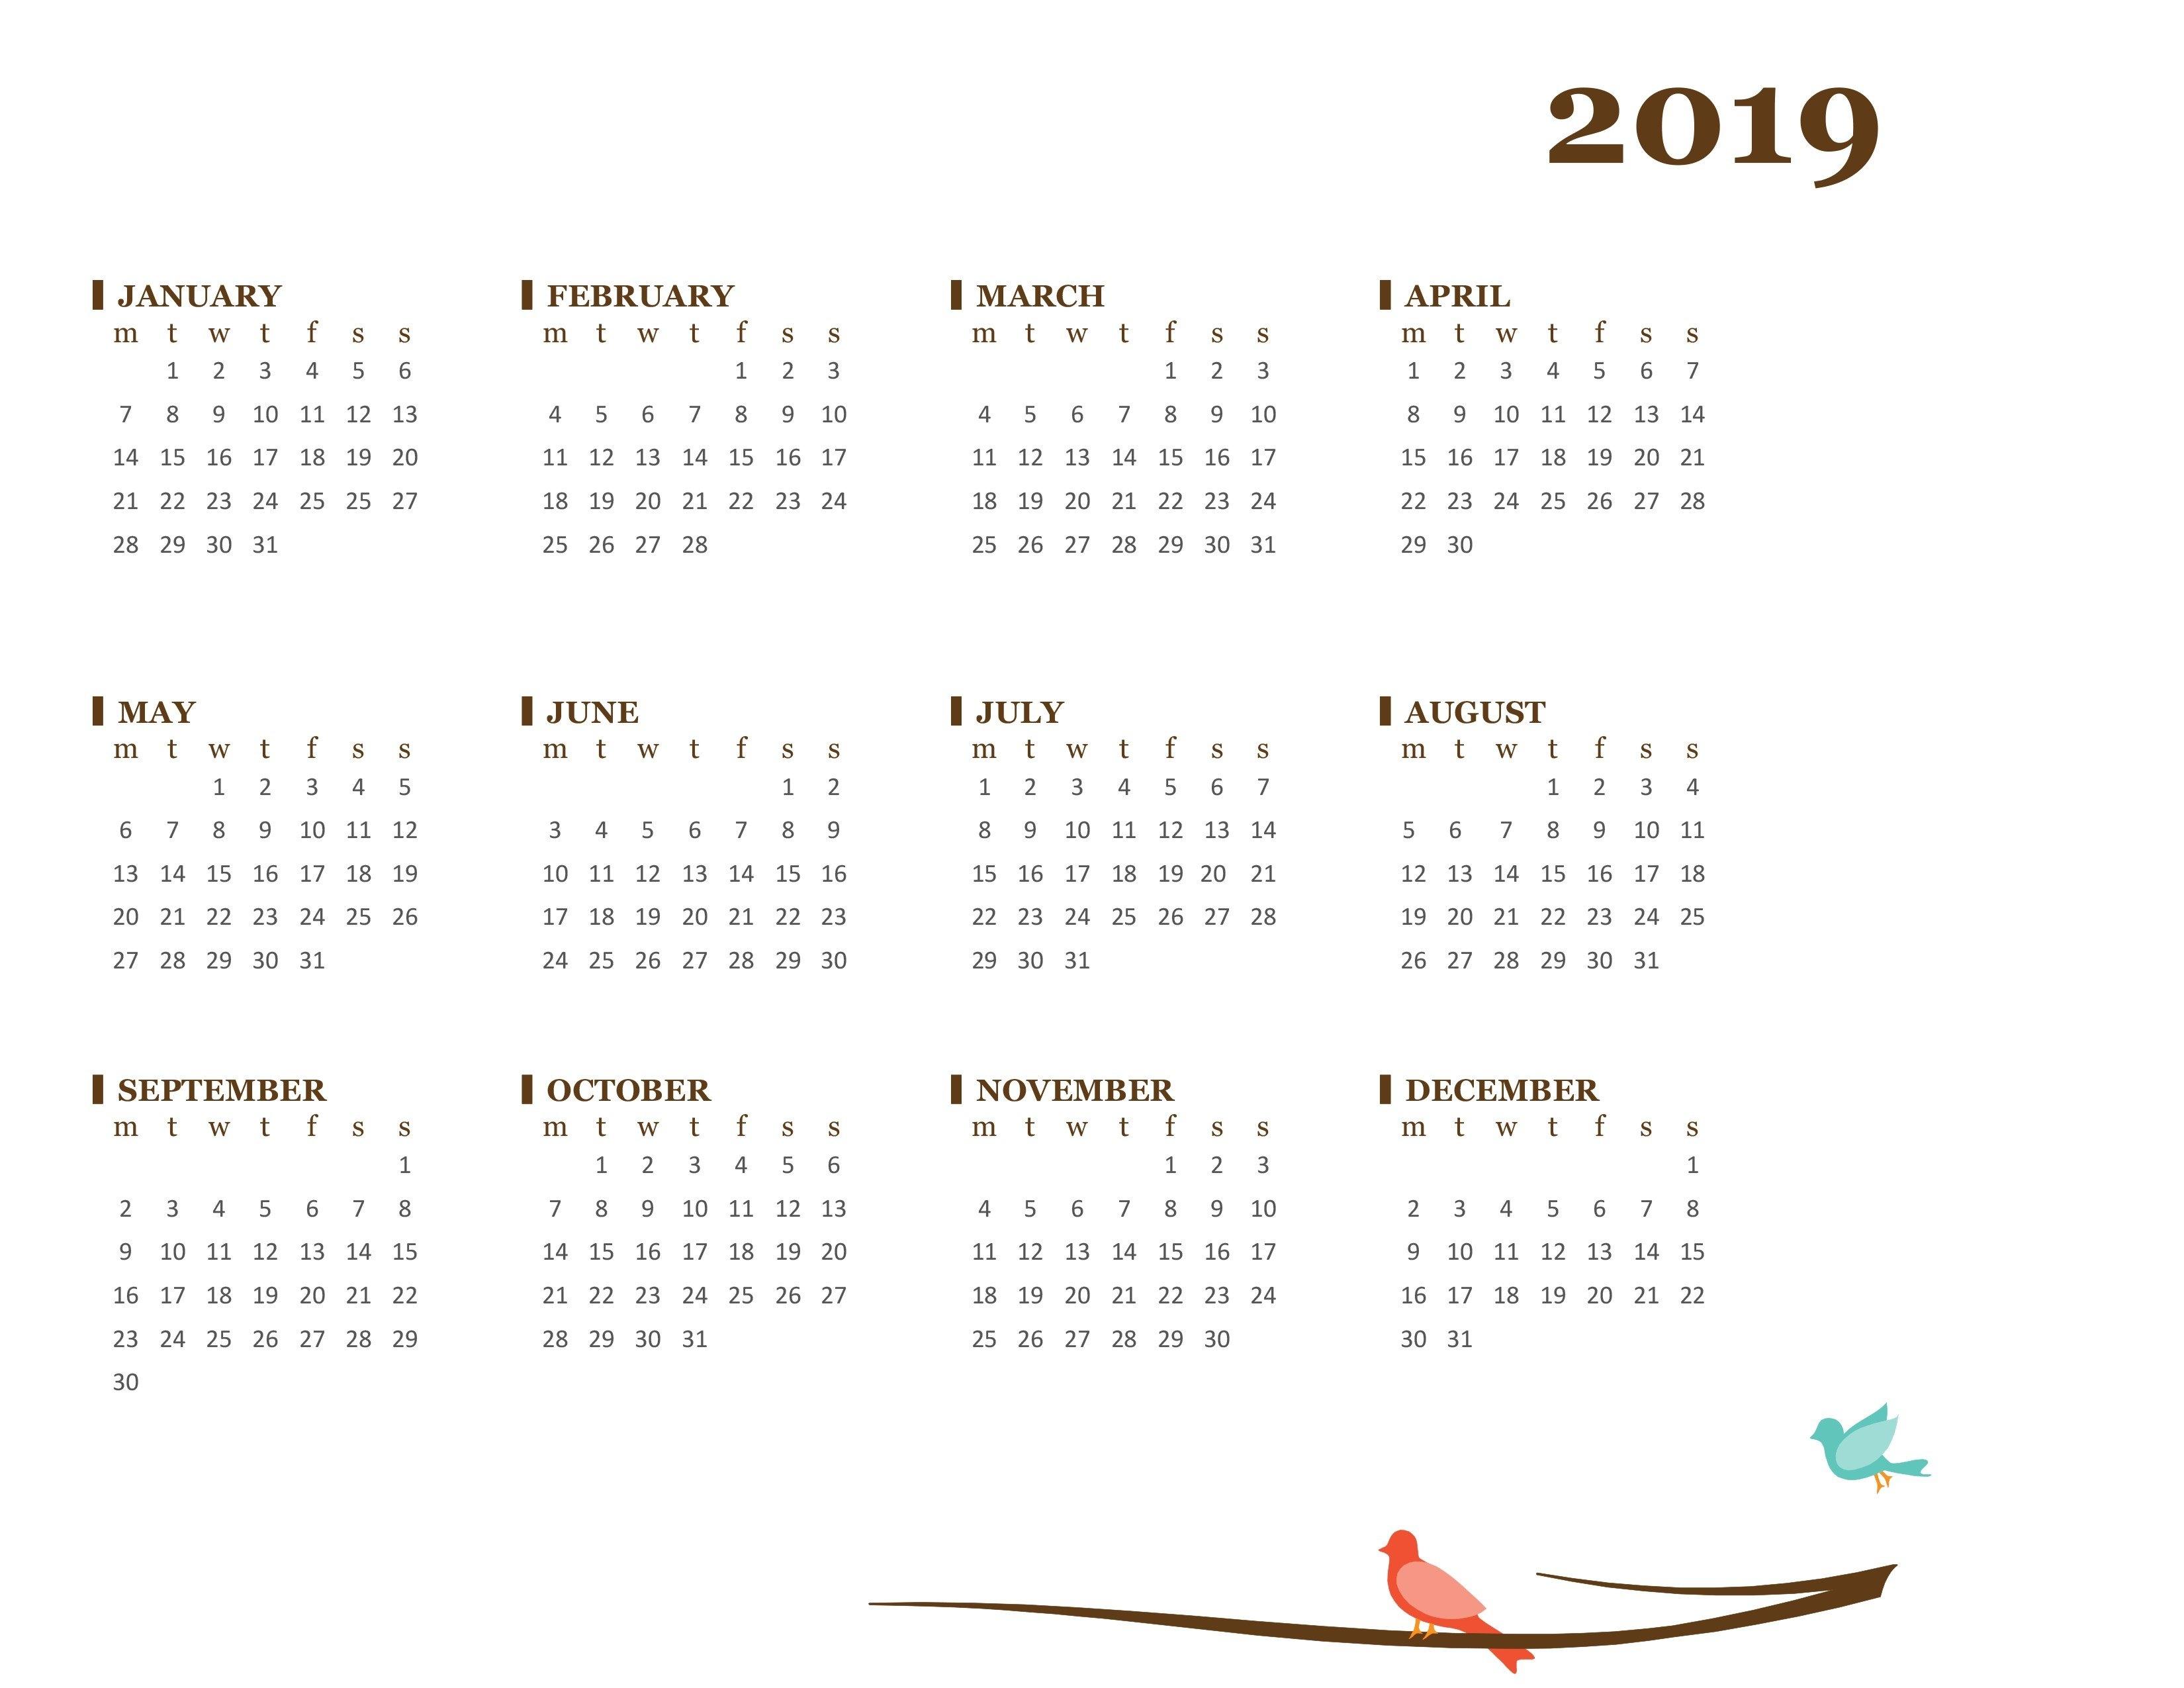 2019 Yearly Calendar (Mon-Sun) January 2019 Calendar 365